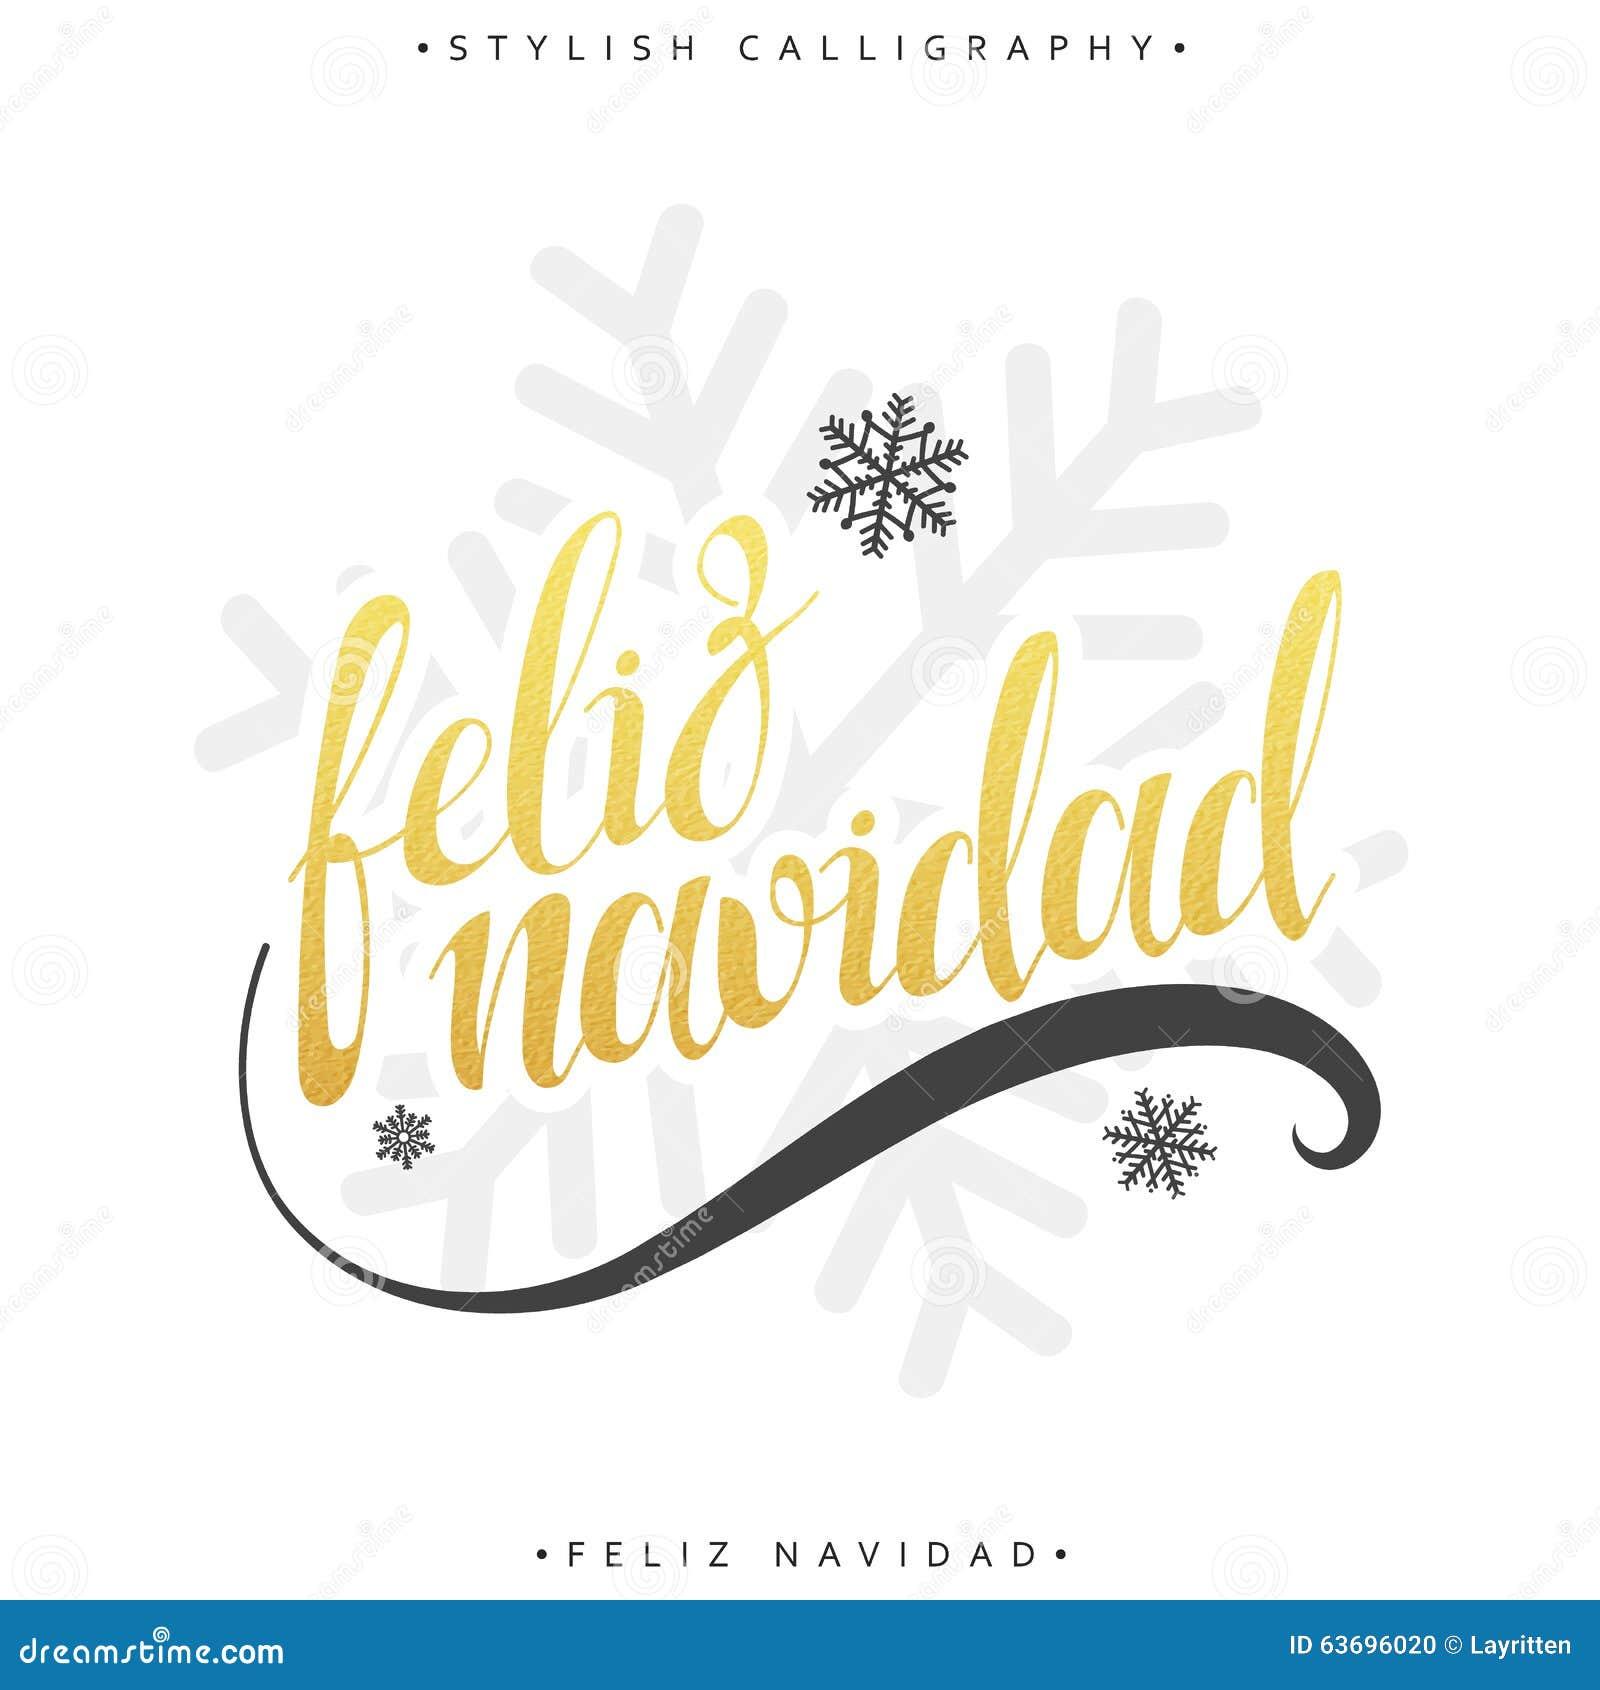 Merry Christmas Card With Greetings In Spanish Language Feliz